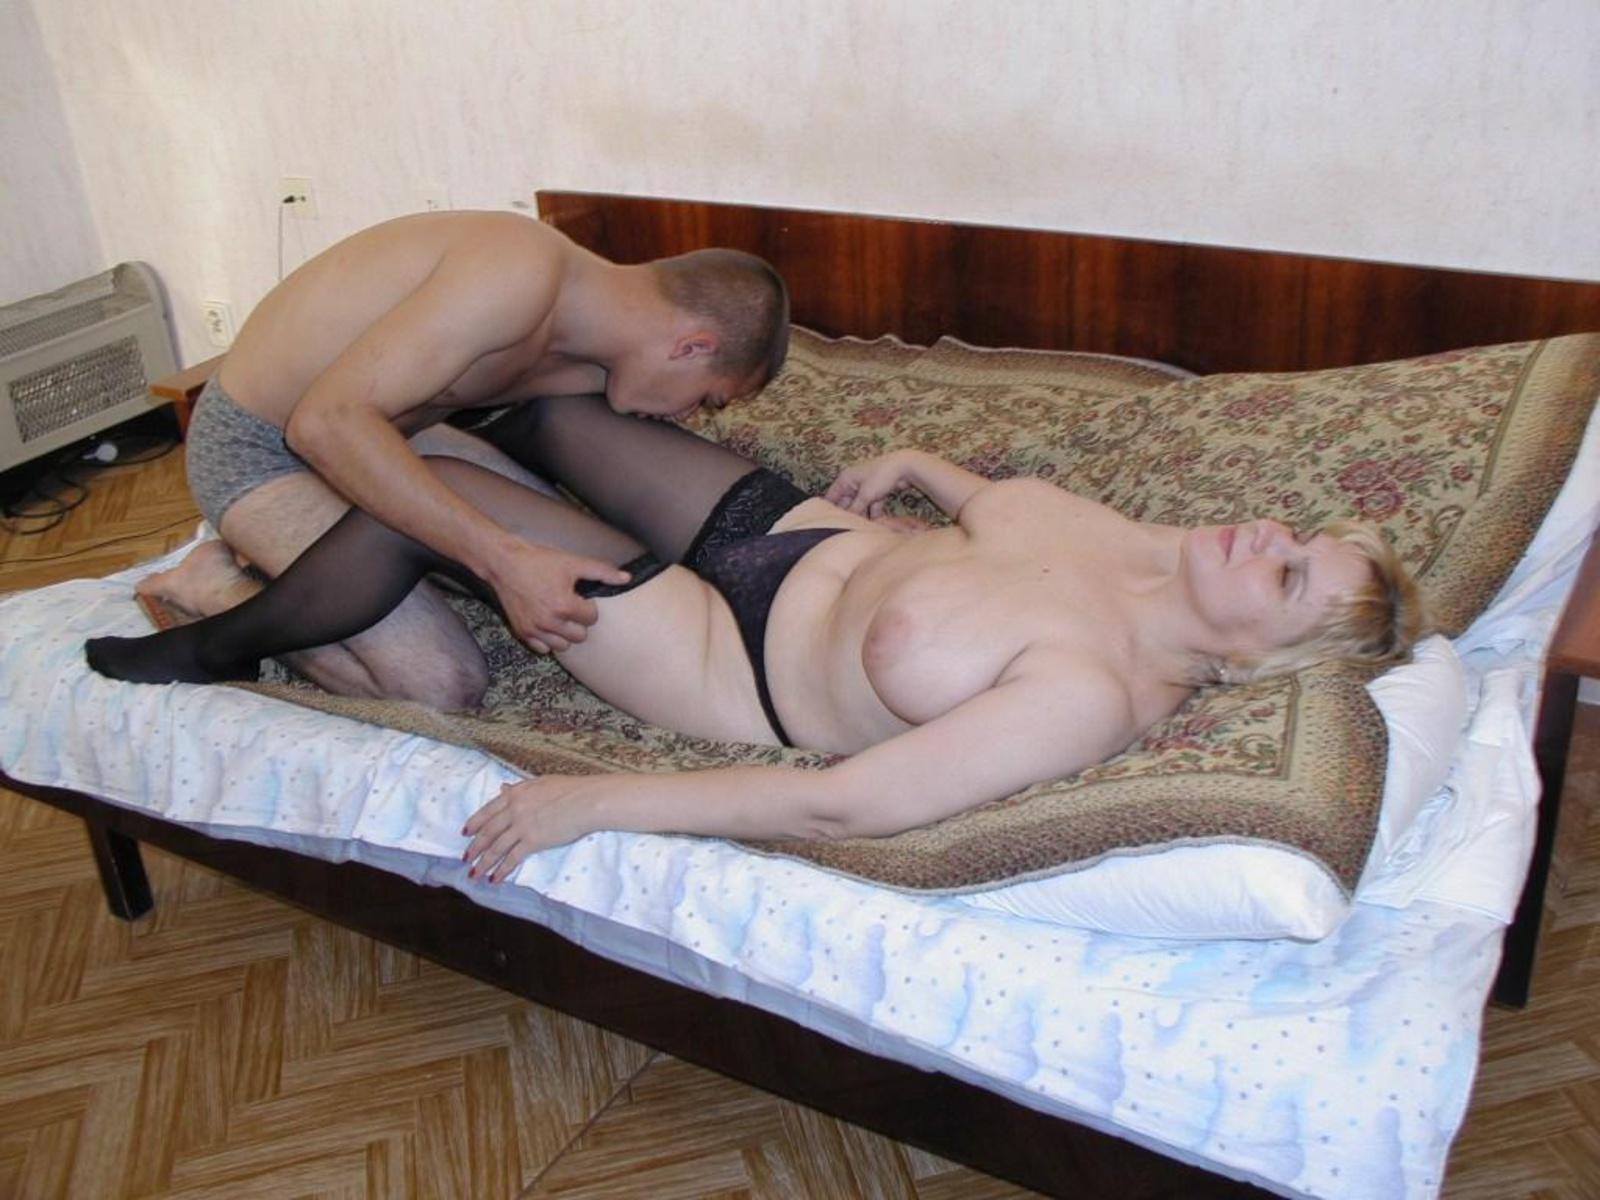 3 Matures And Boy Porn russian mature and boy 3 - milf - hot photos